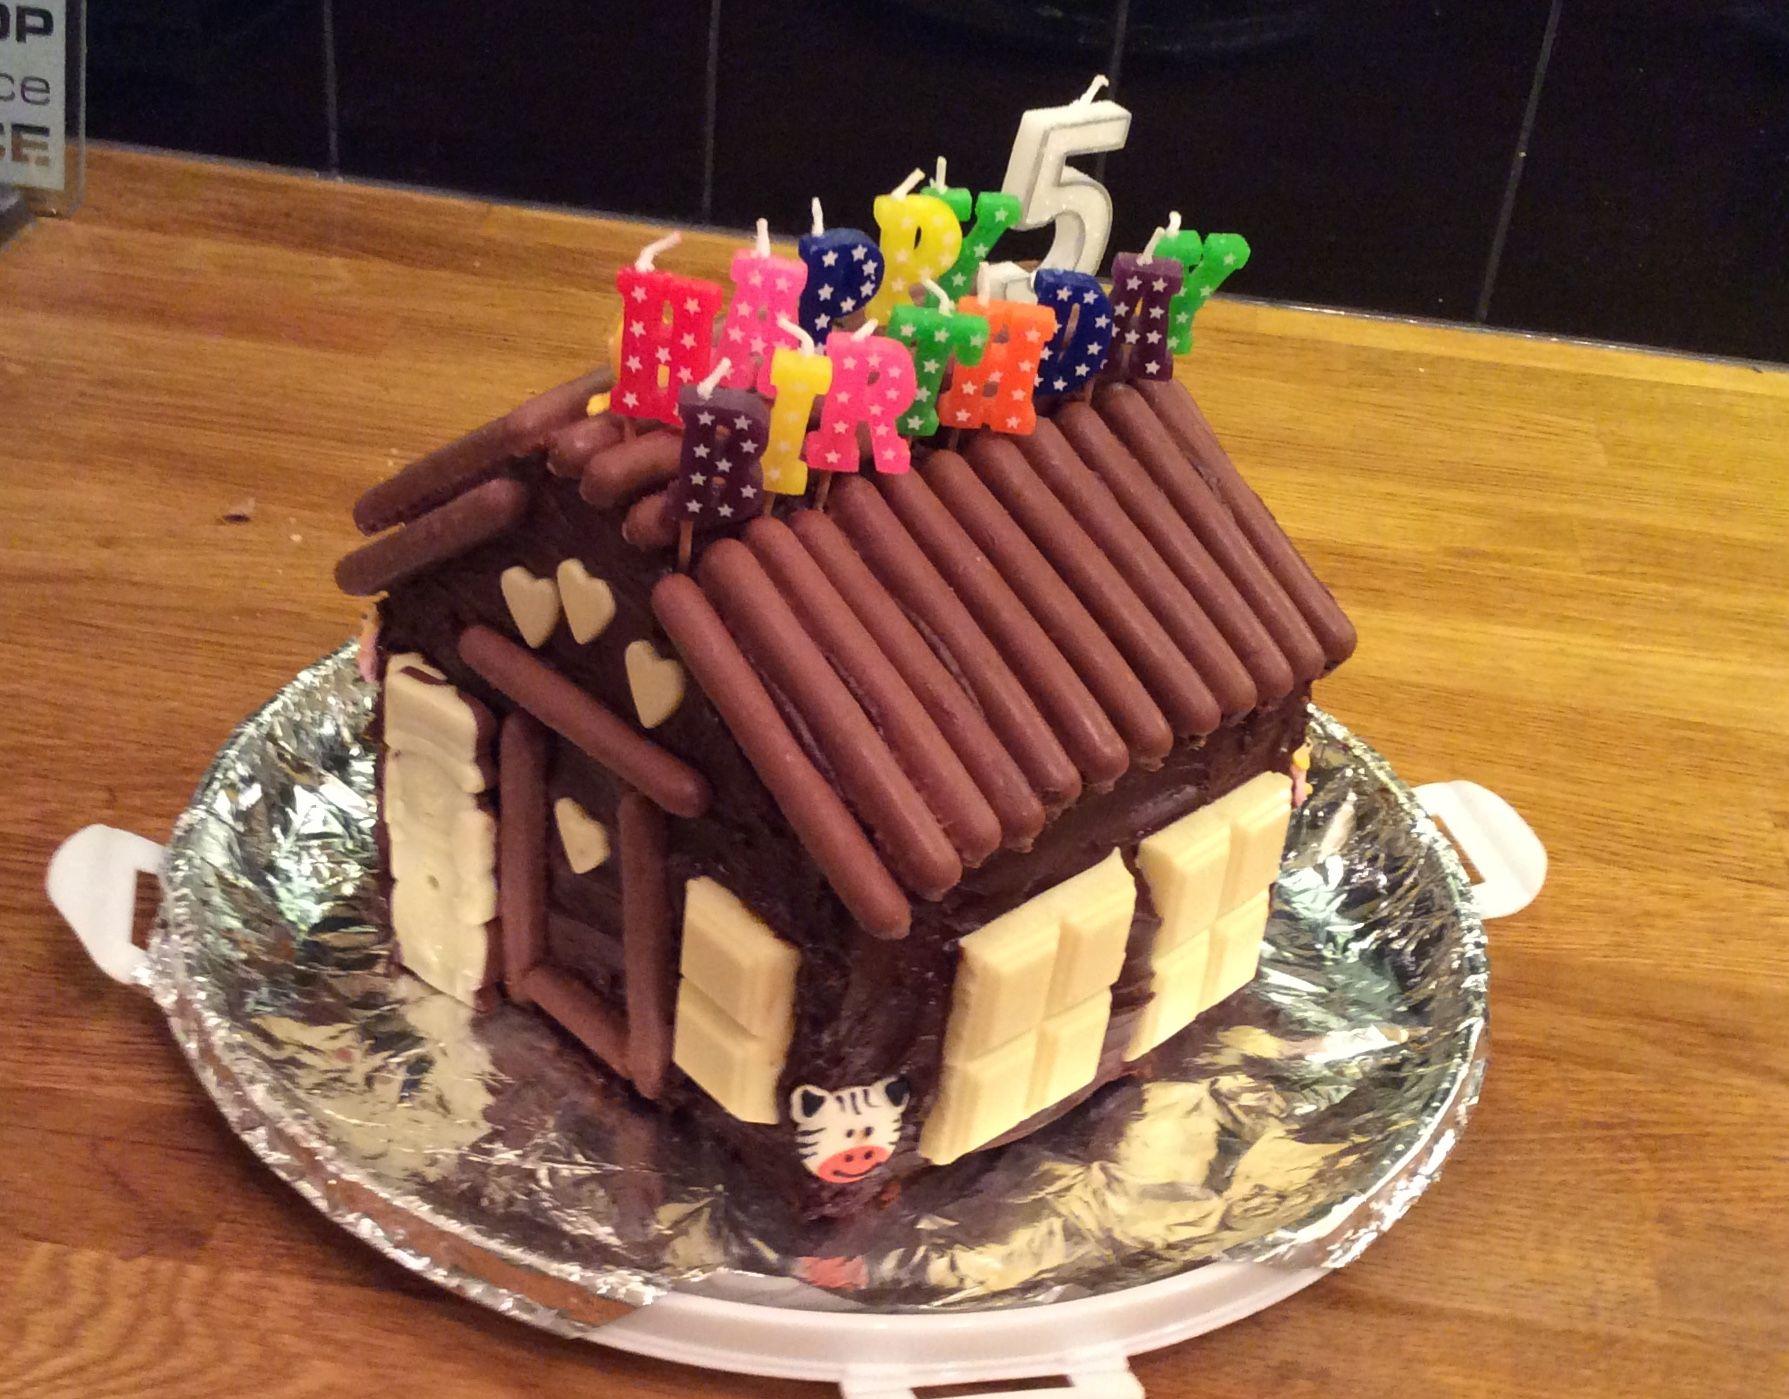 Log Cabin Cake No 2 Chrissy S Cakes Cake Desserts Food